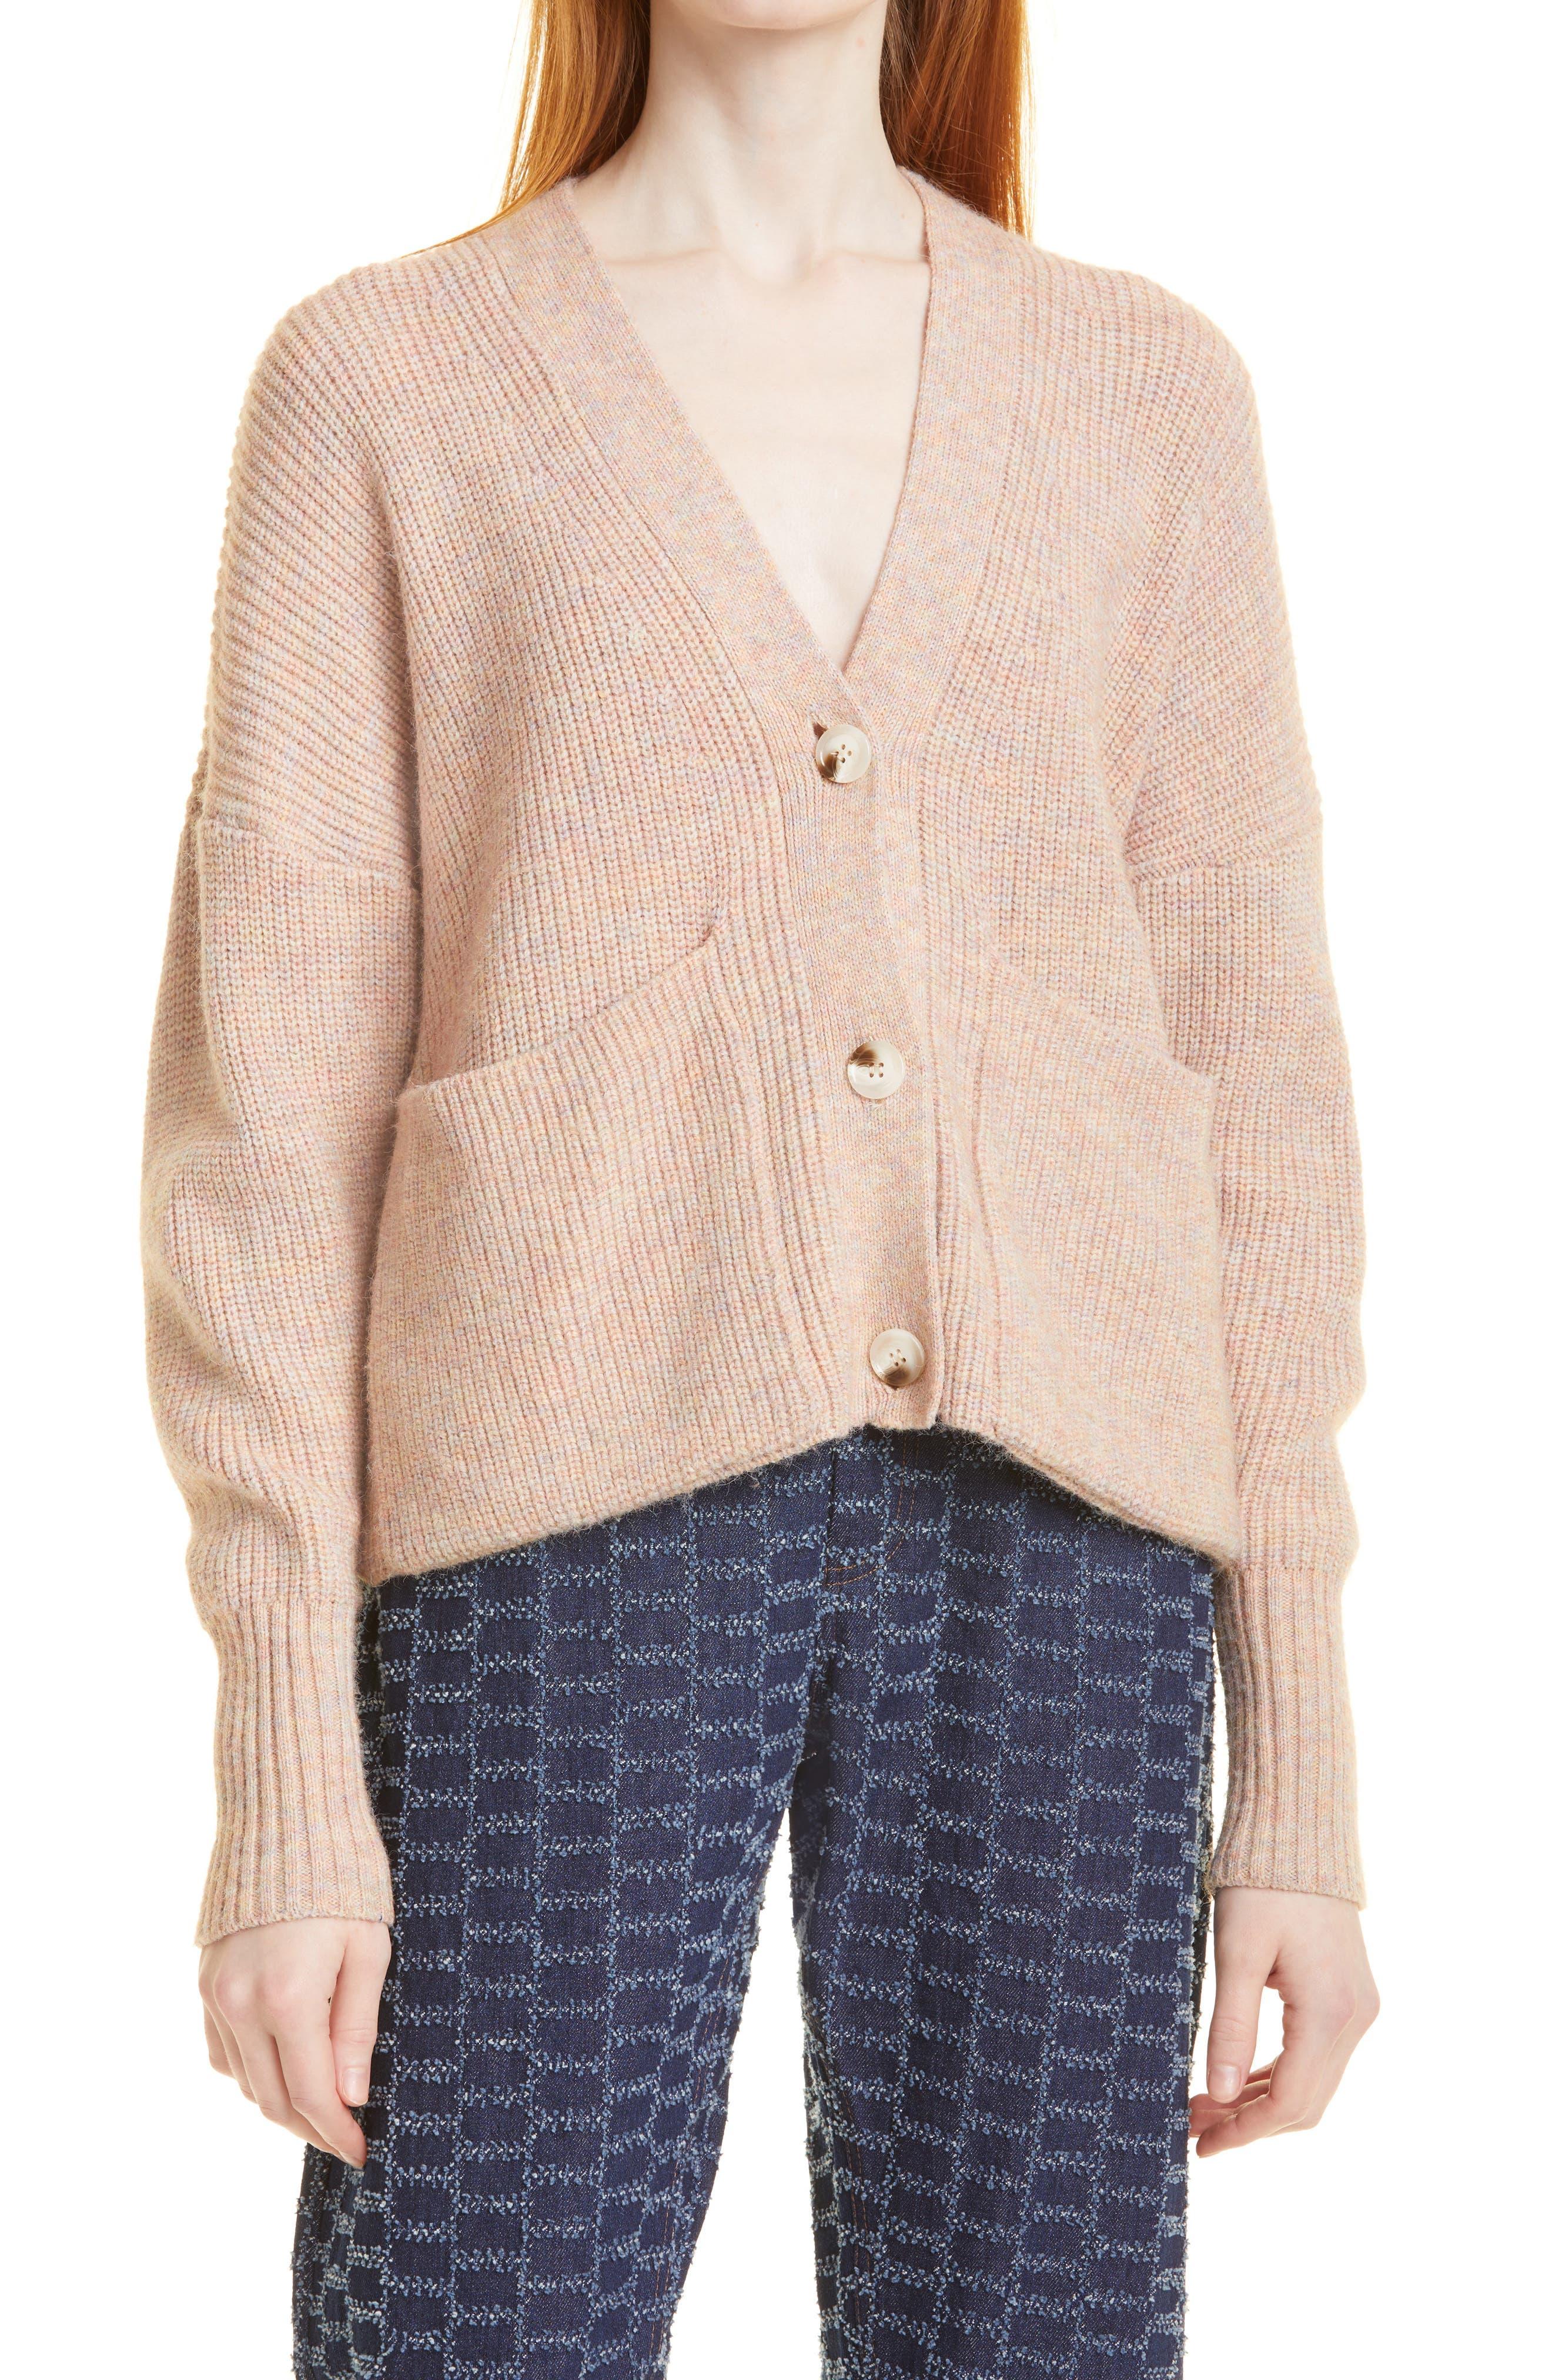 Reese Shaker Stitch Cardigan Sweater